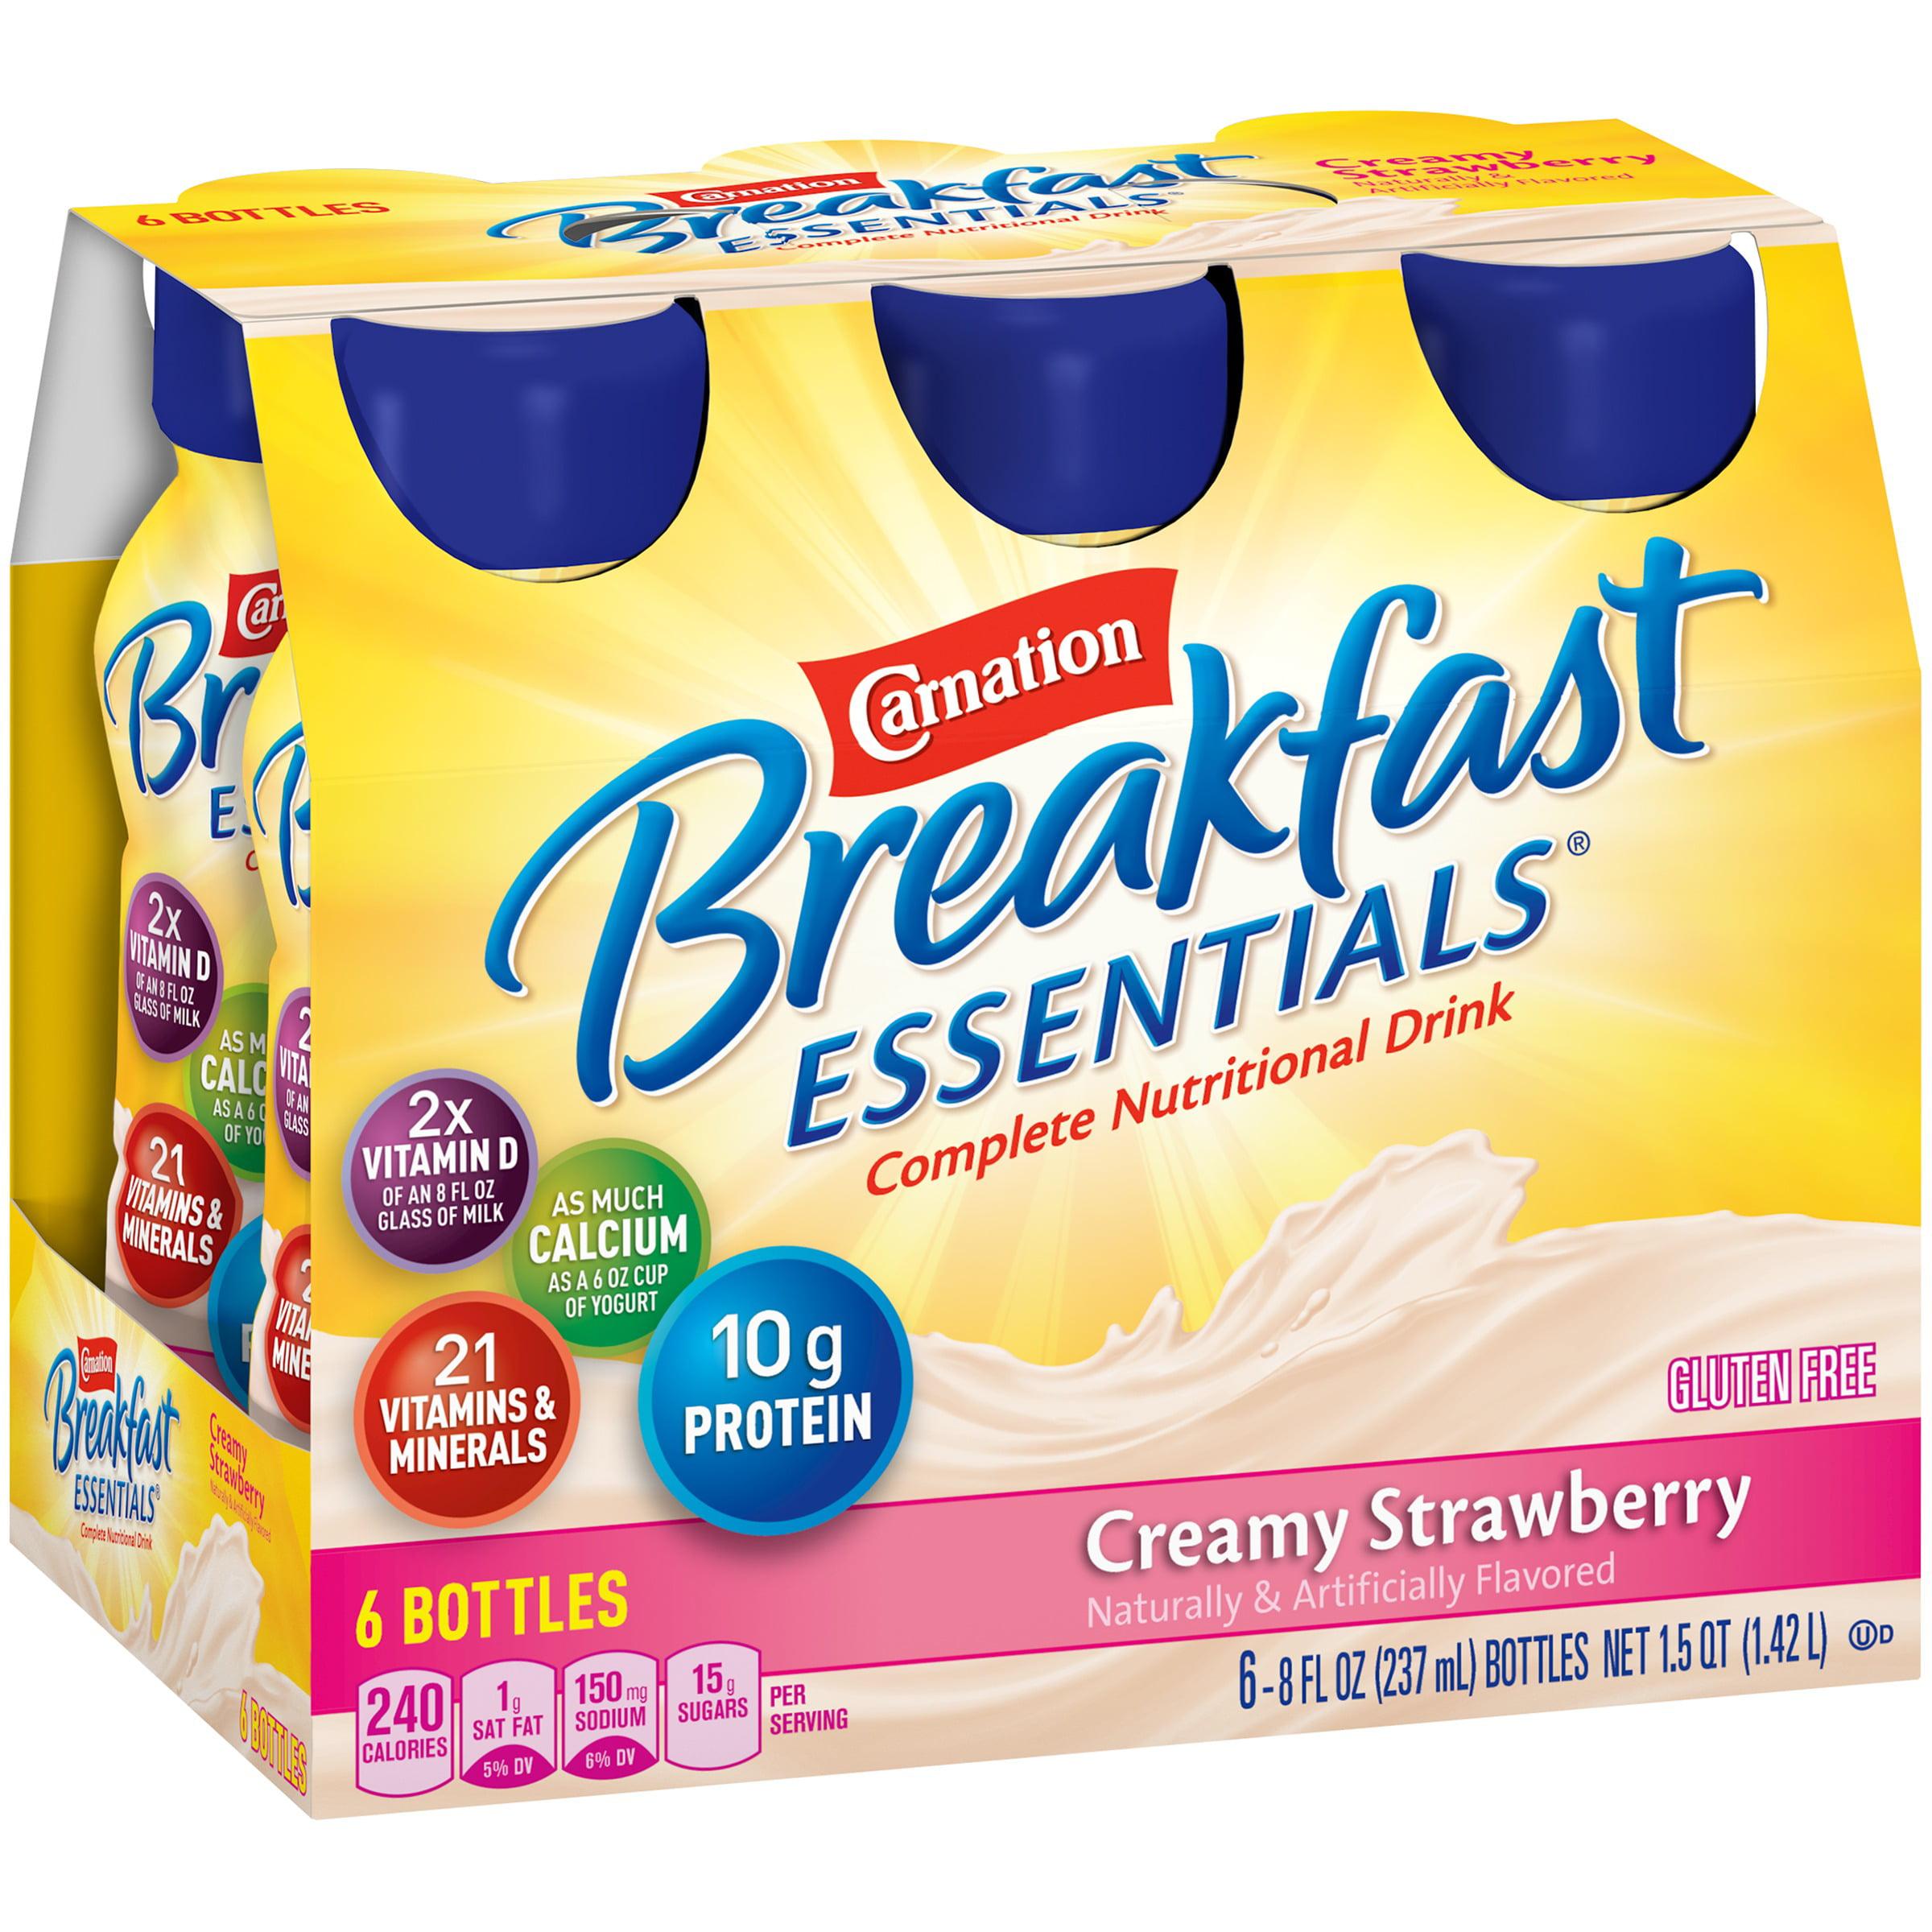 Carnation Breakfast Essentials Creamy Strawberry Complete Nutritional Drink, 8 fl oz, 6 ct